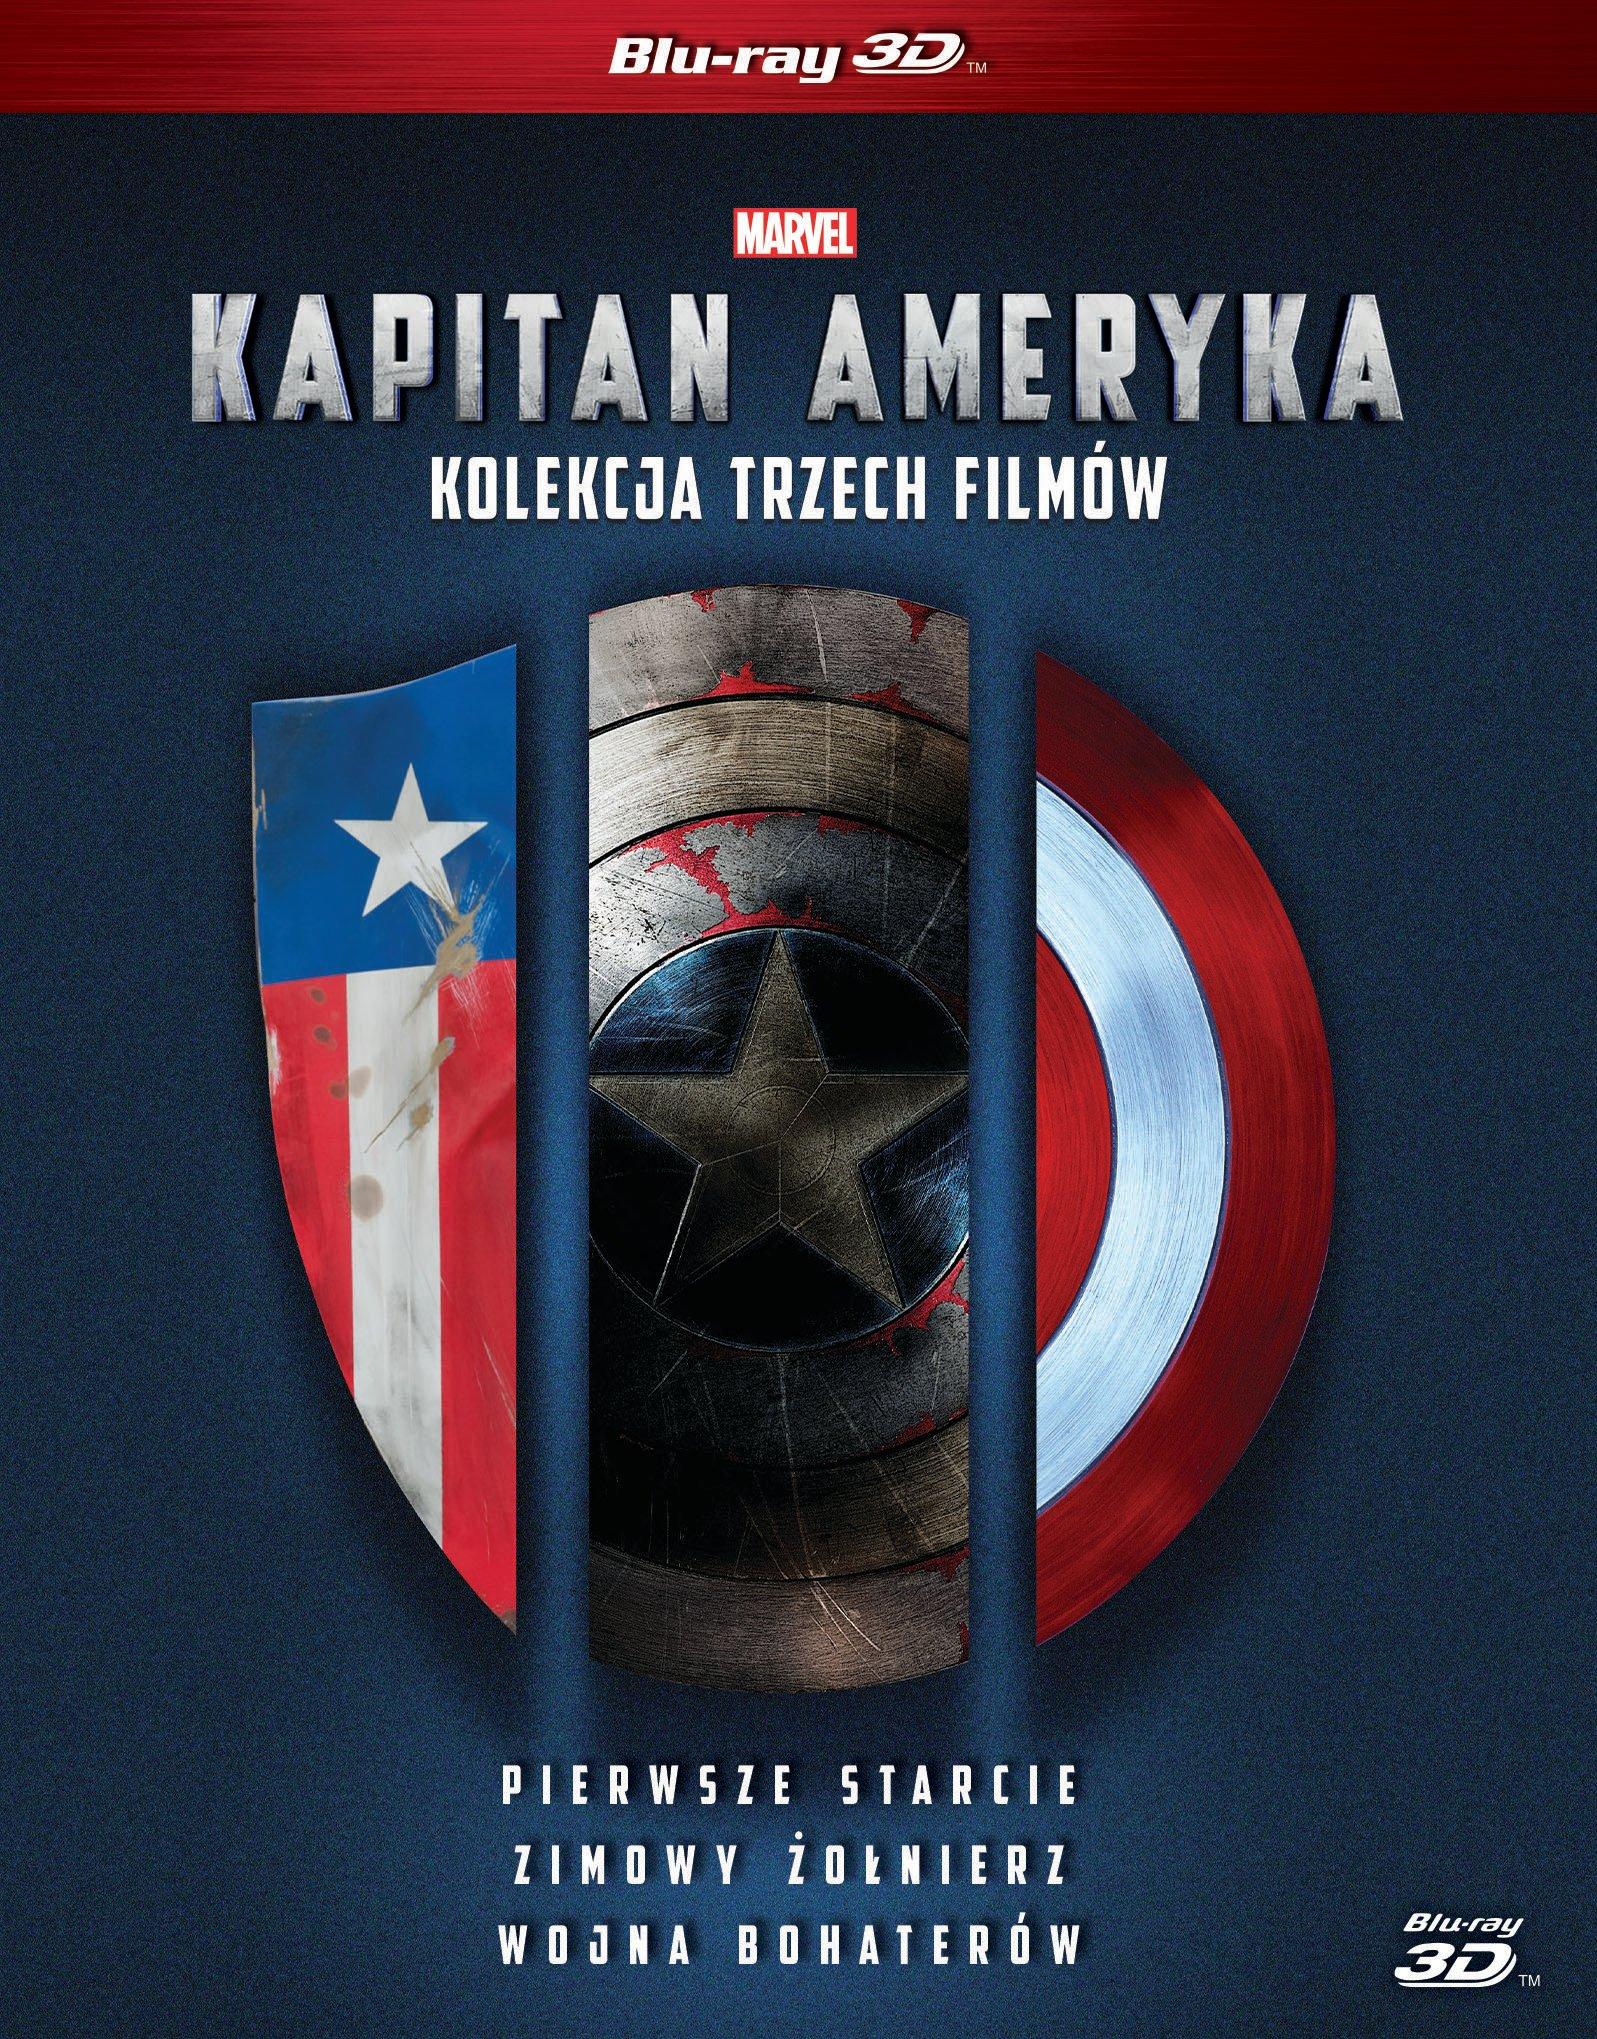 Kapitan Ameryka Trylogia BLU-RAY 3D